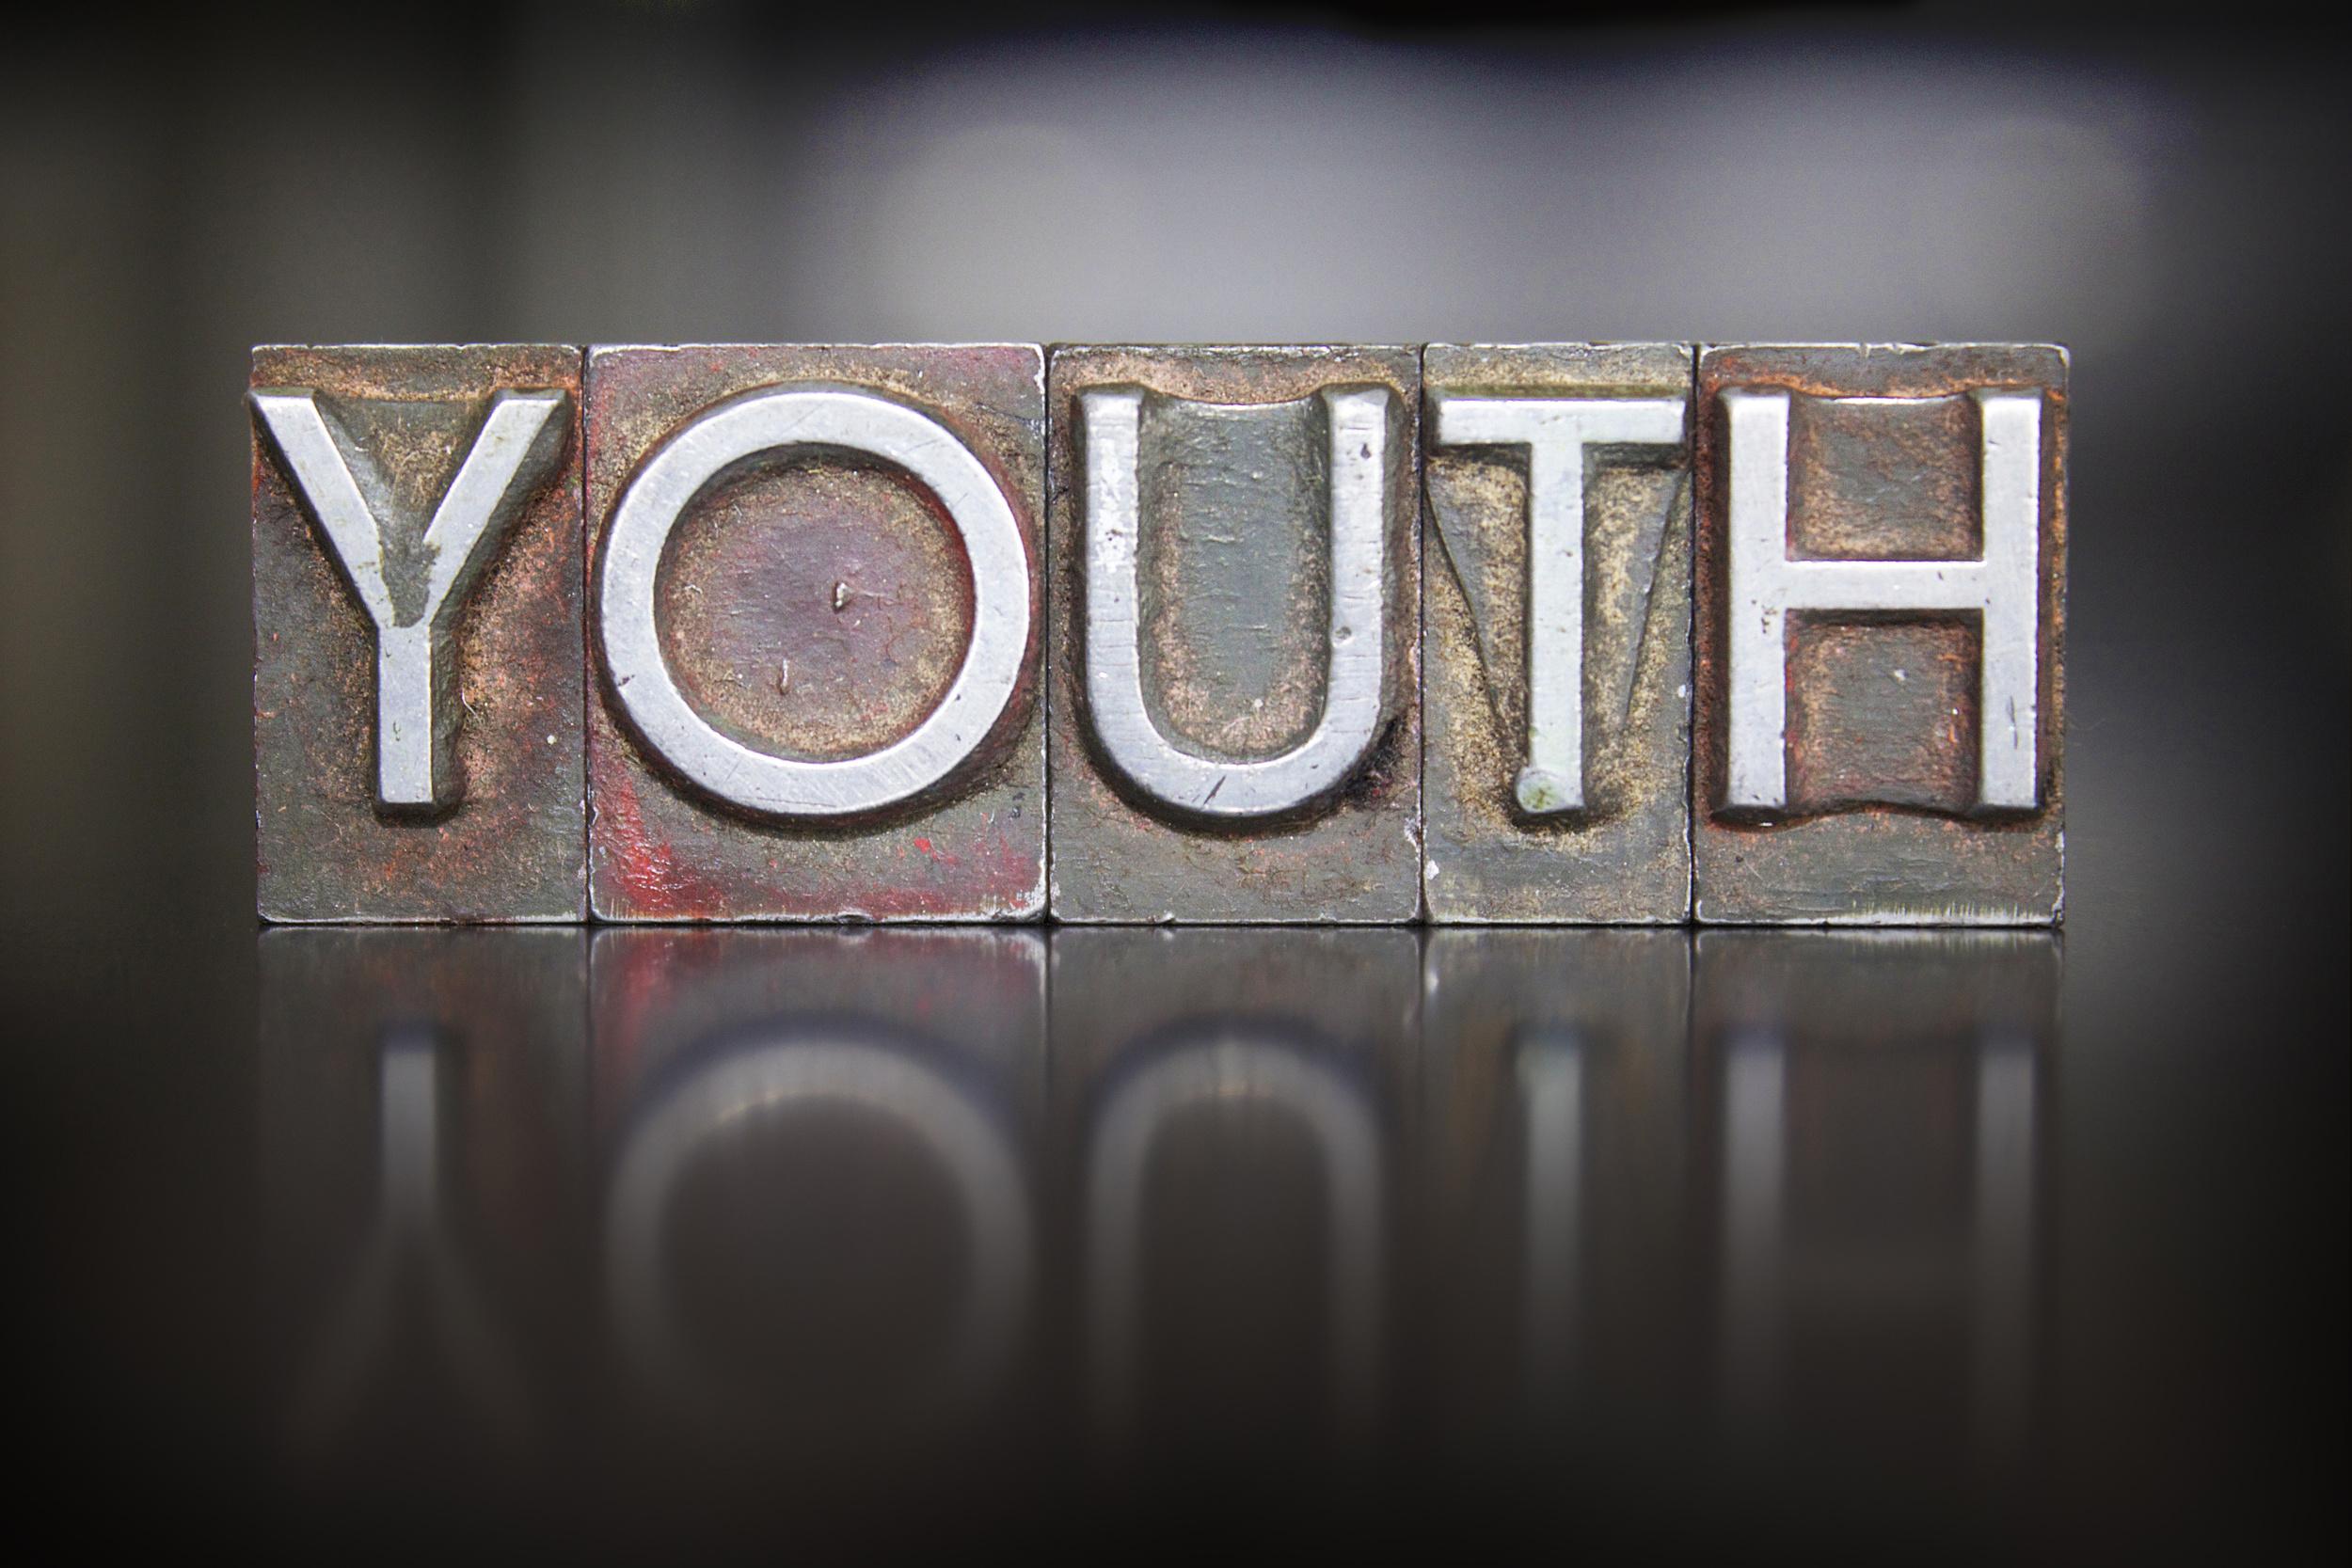 Youth anti bully programs Edmonton.